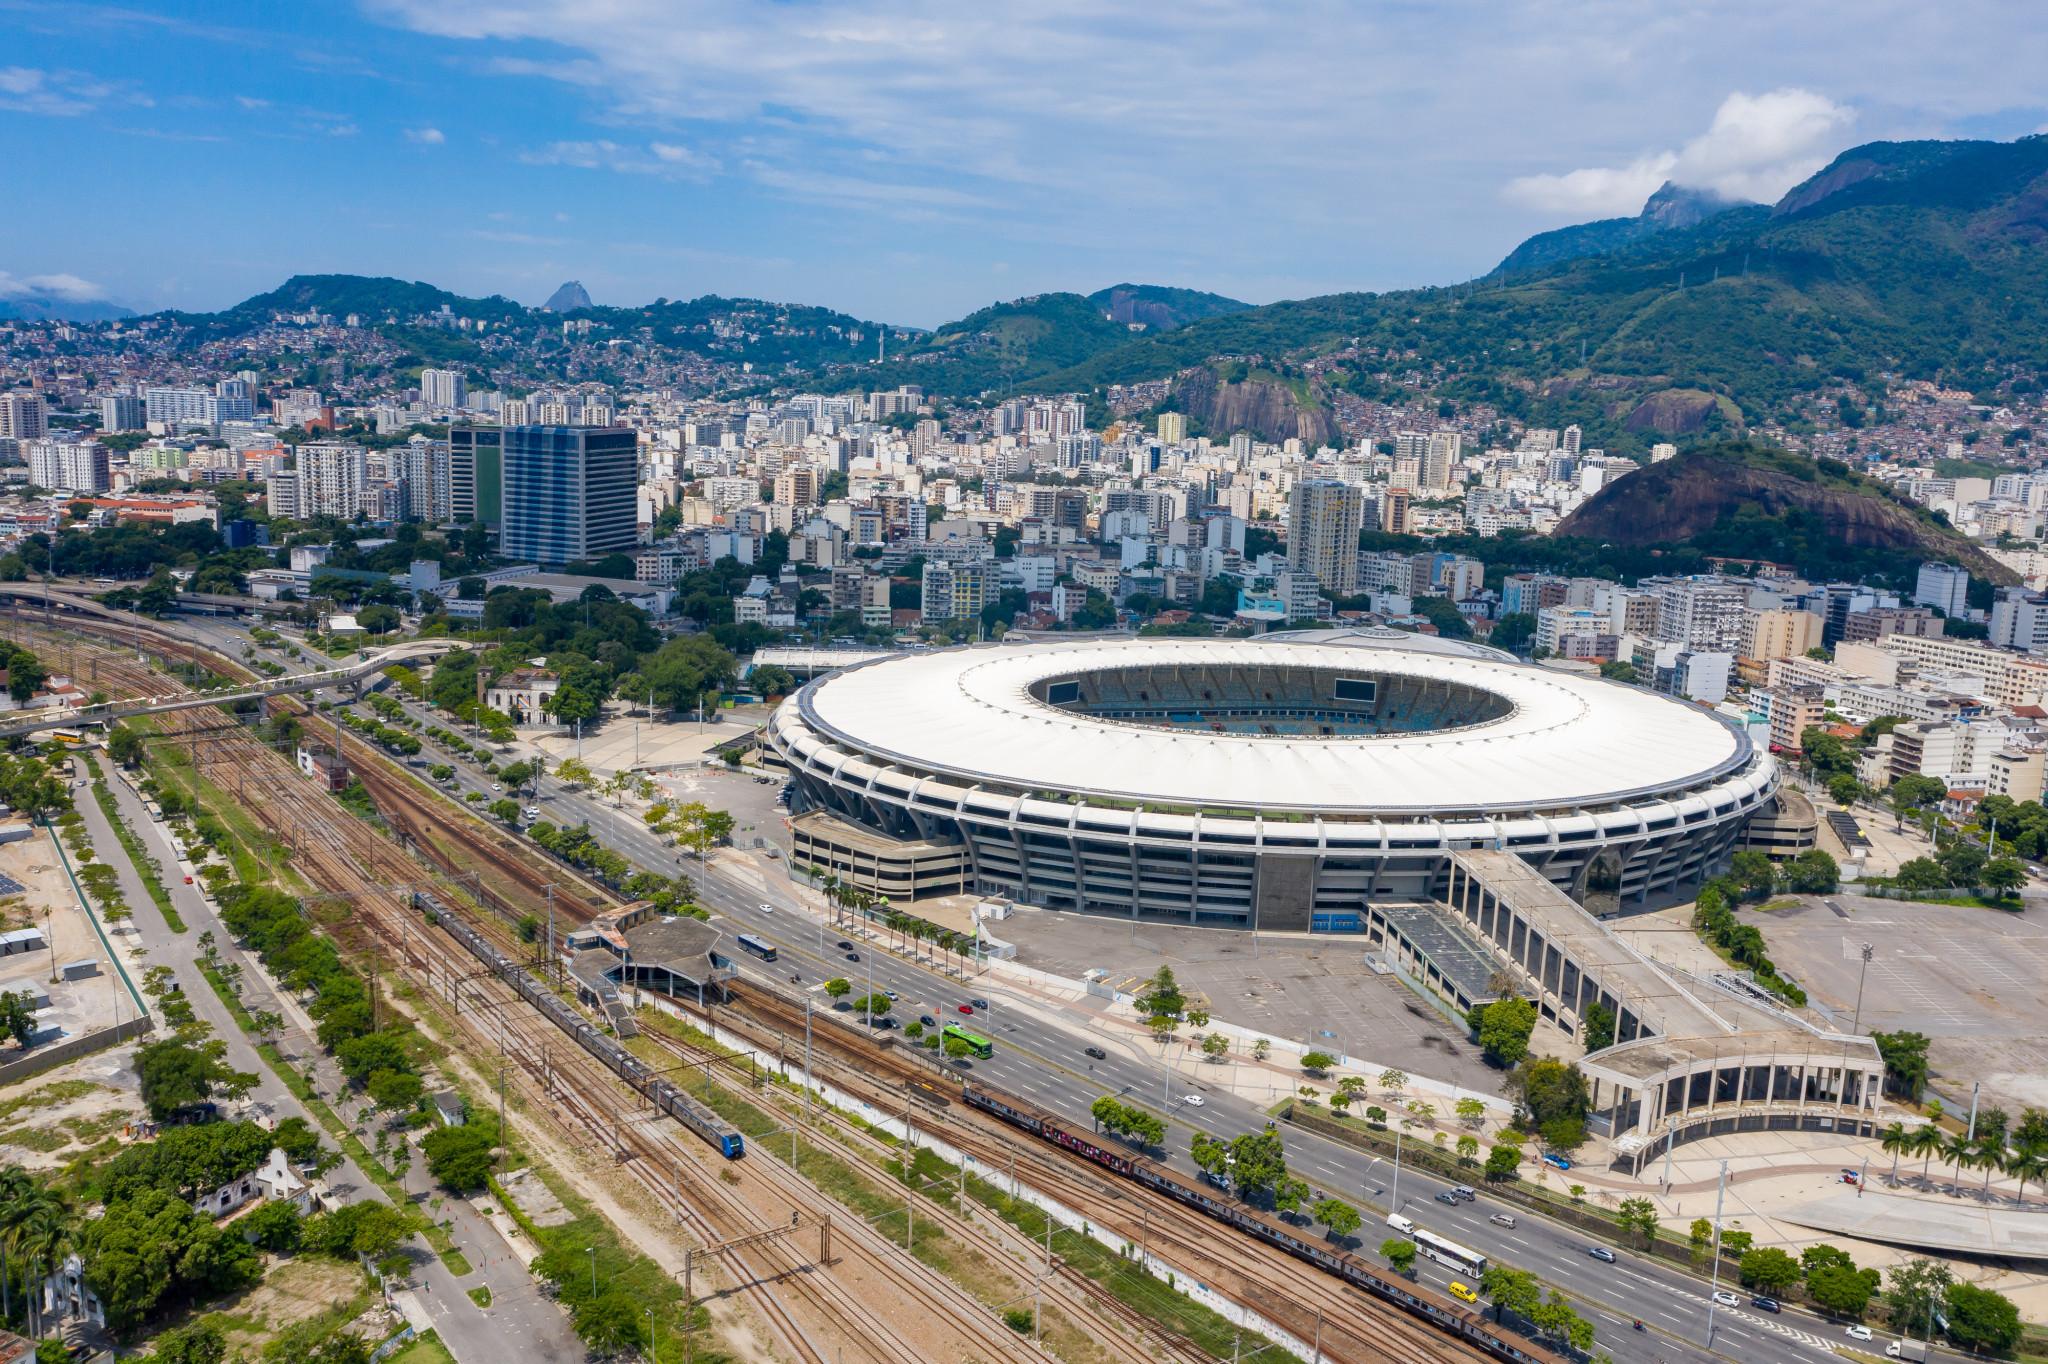 Mixed reaction to plans to rename Maracana Stadium in honour of Pelé